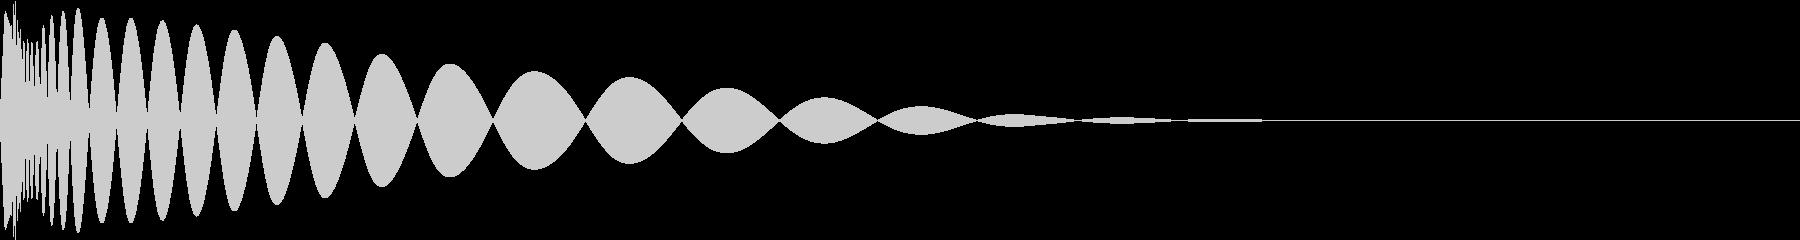 DTM Kick 30 オリジナル音源の未再生の波形